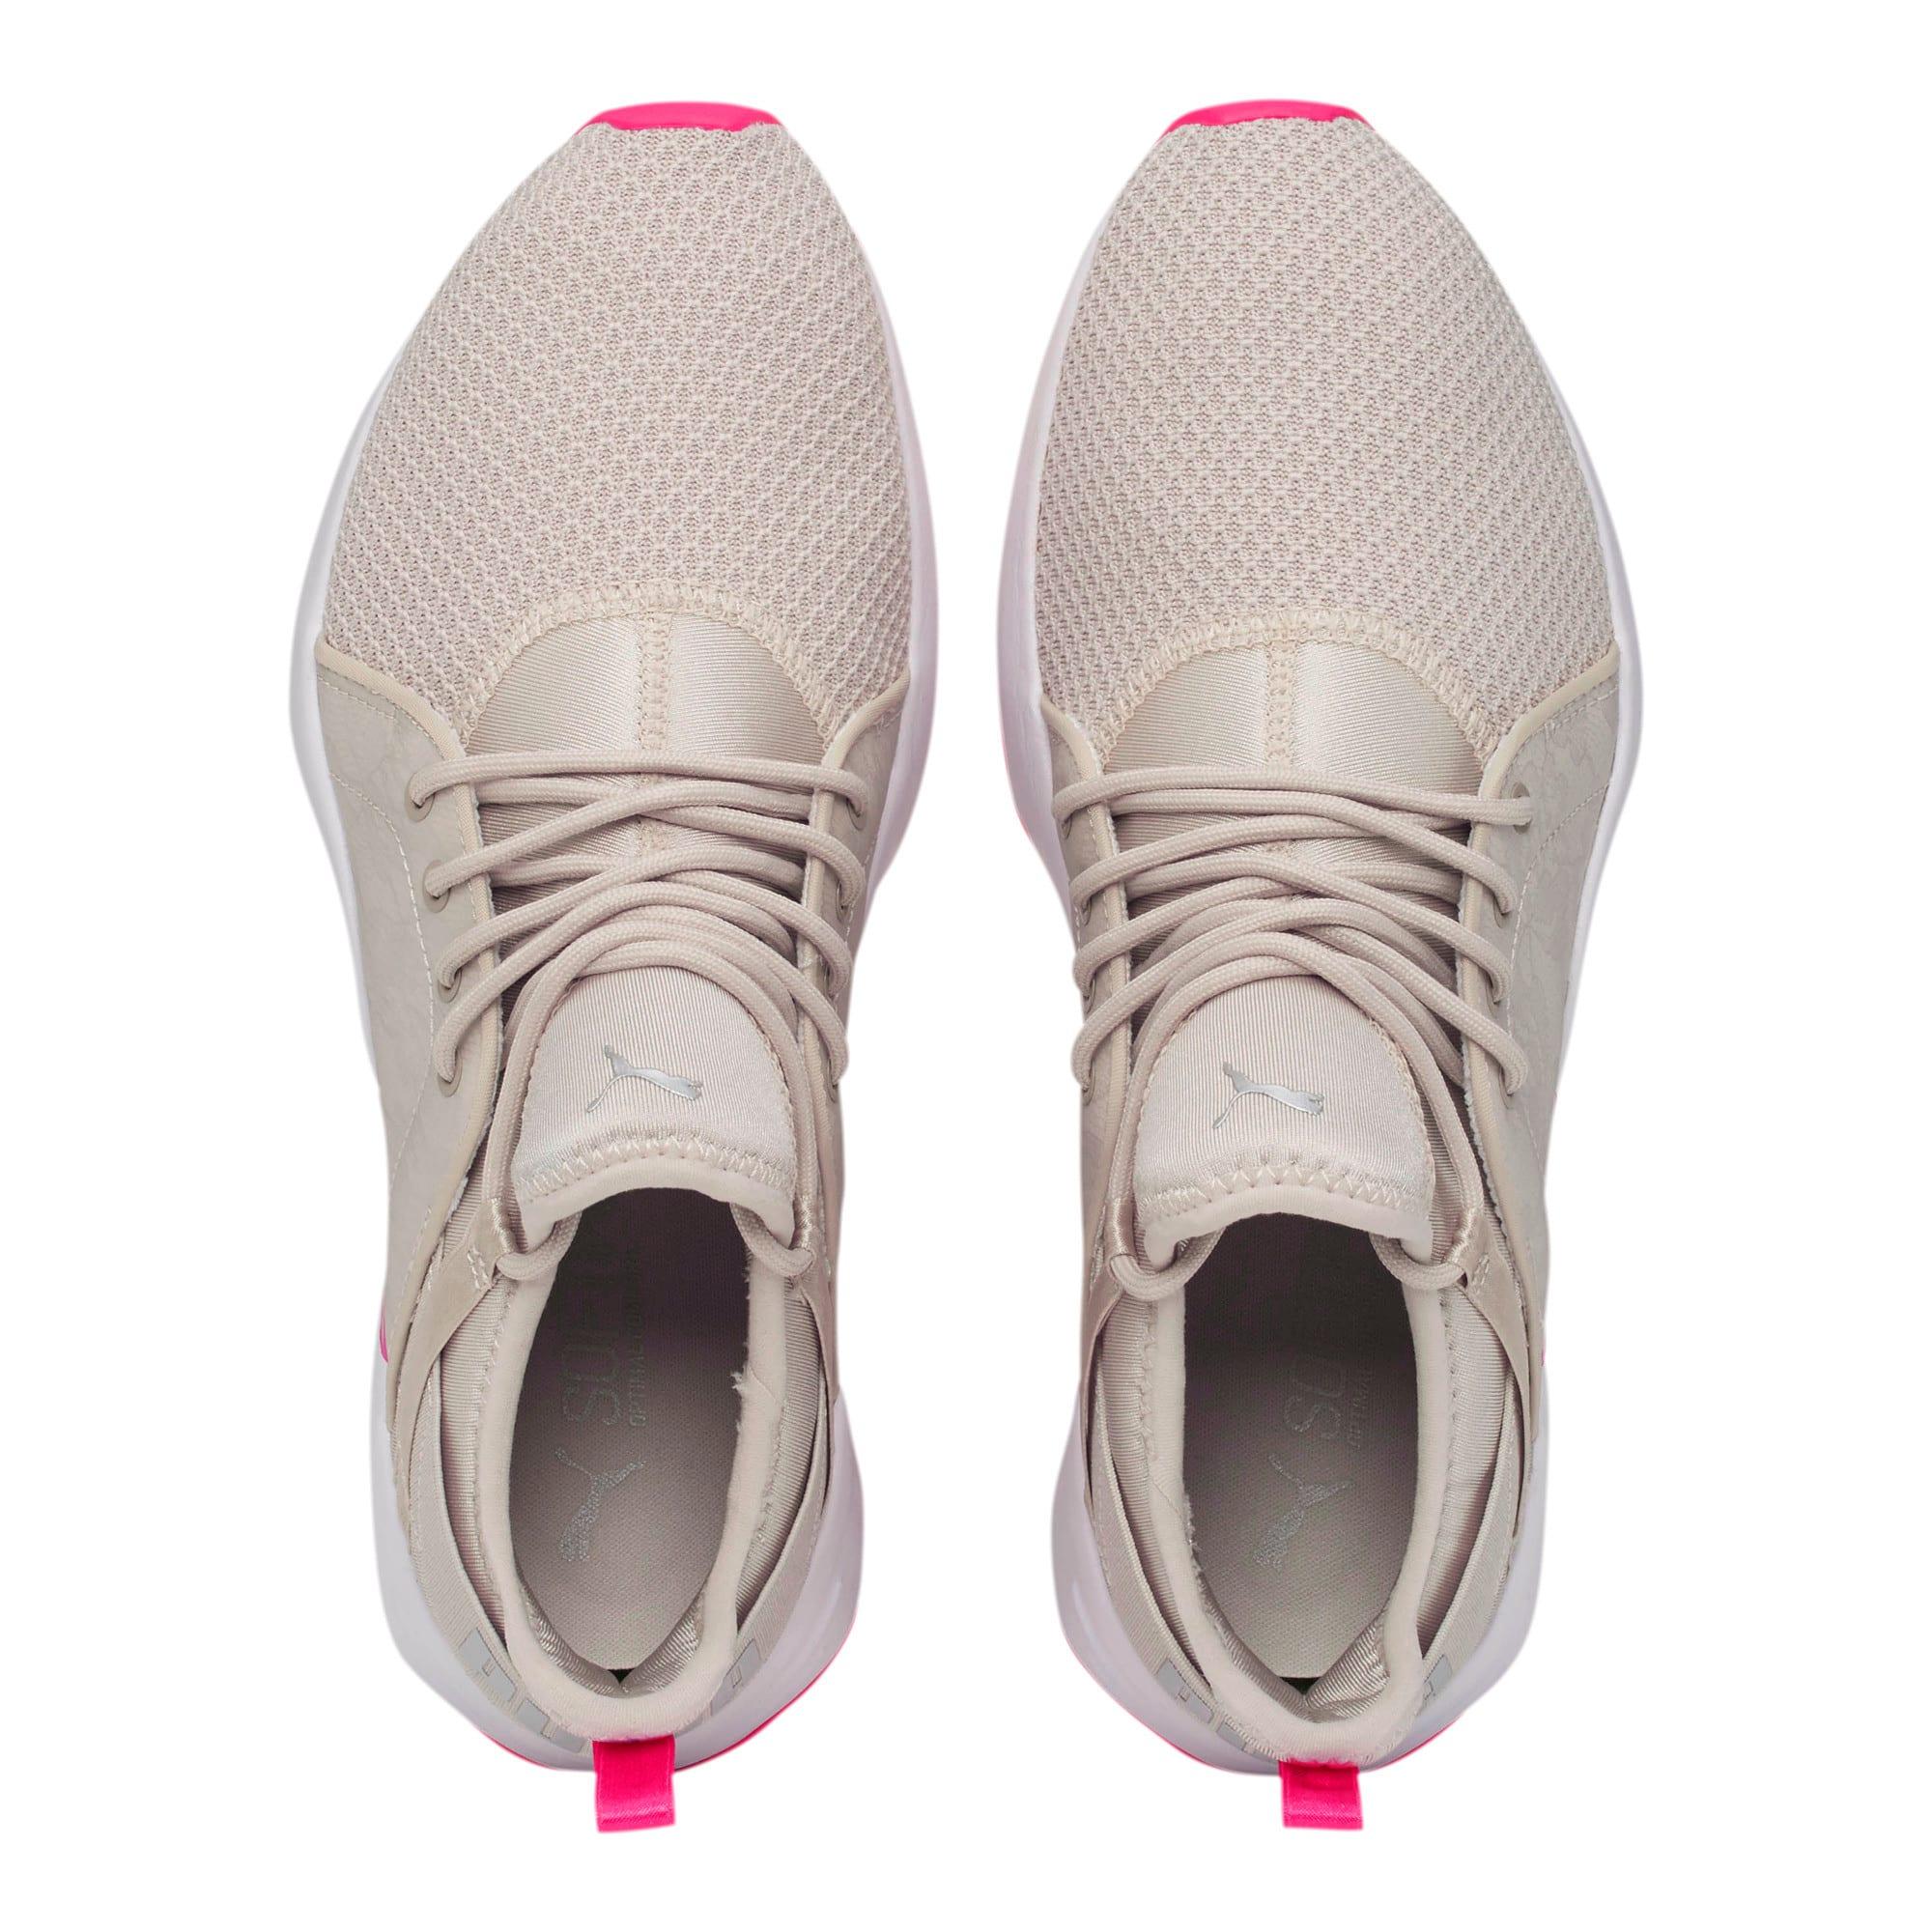 Thumbnail 6 of Sirena Summer Women's Sneakers, Silver Gray-Puma White, medium